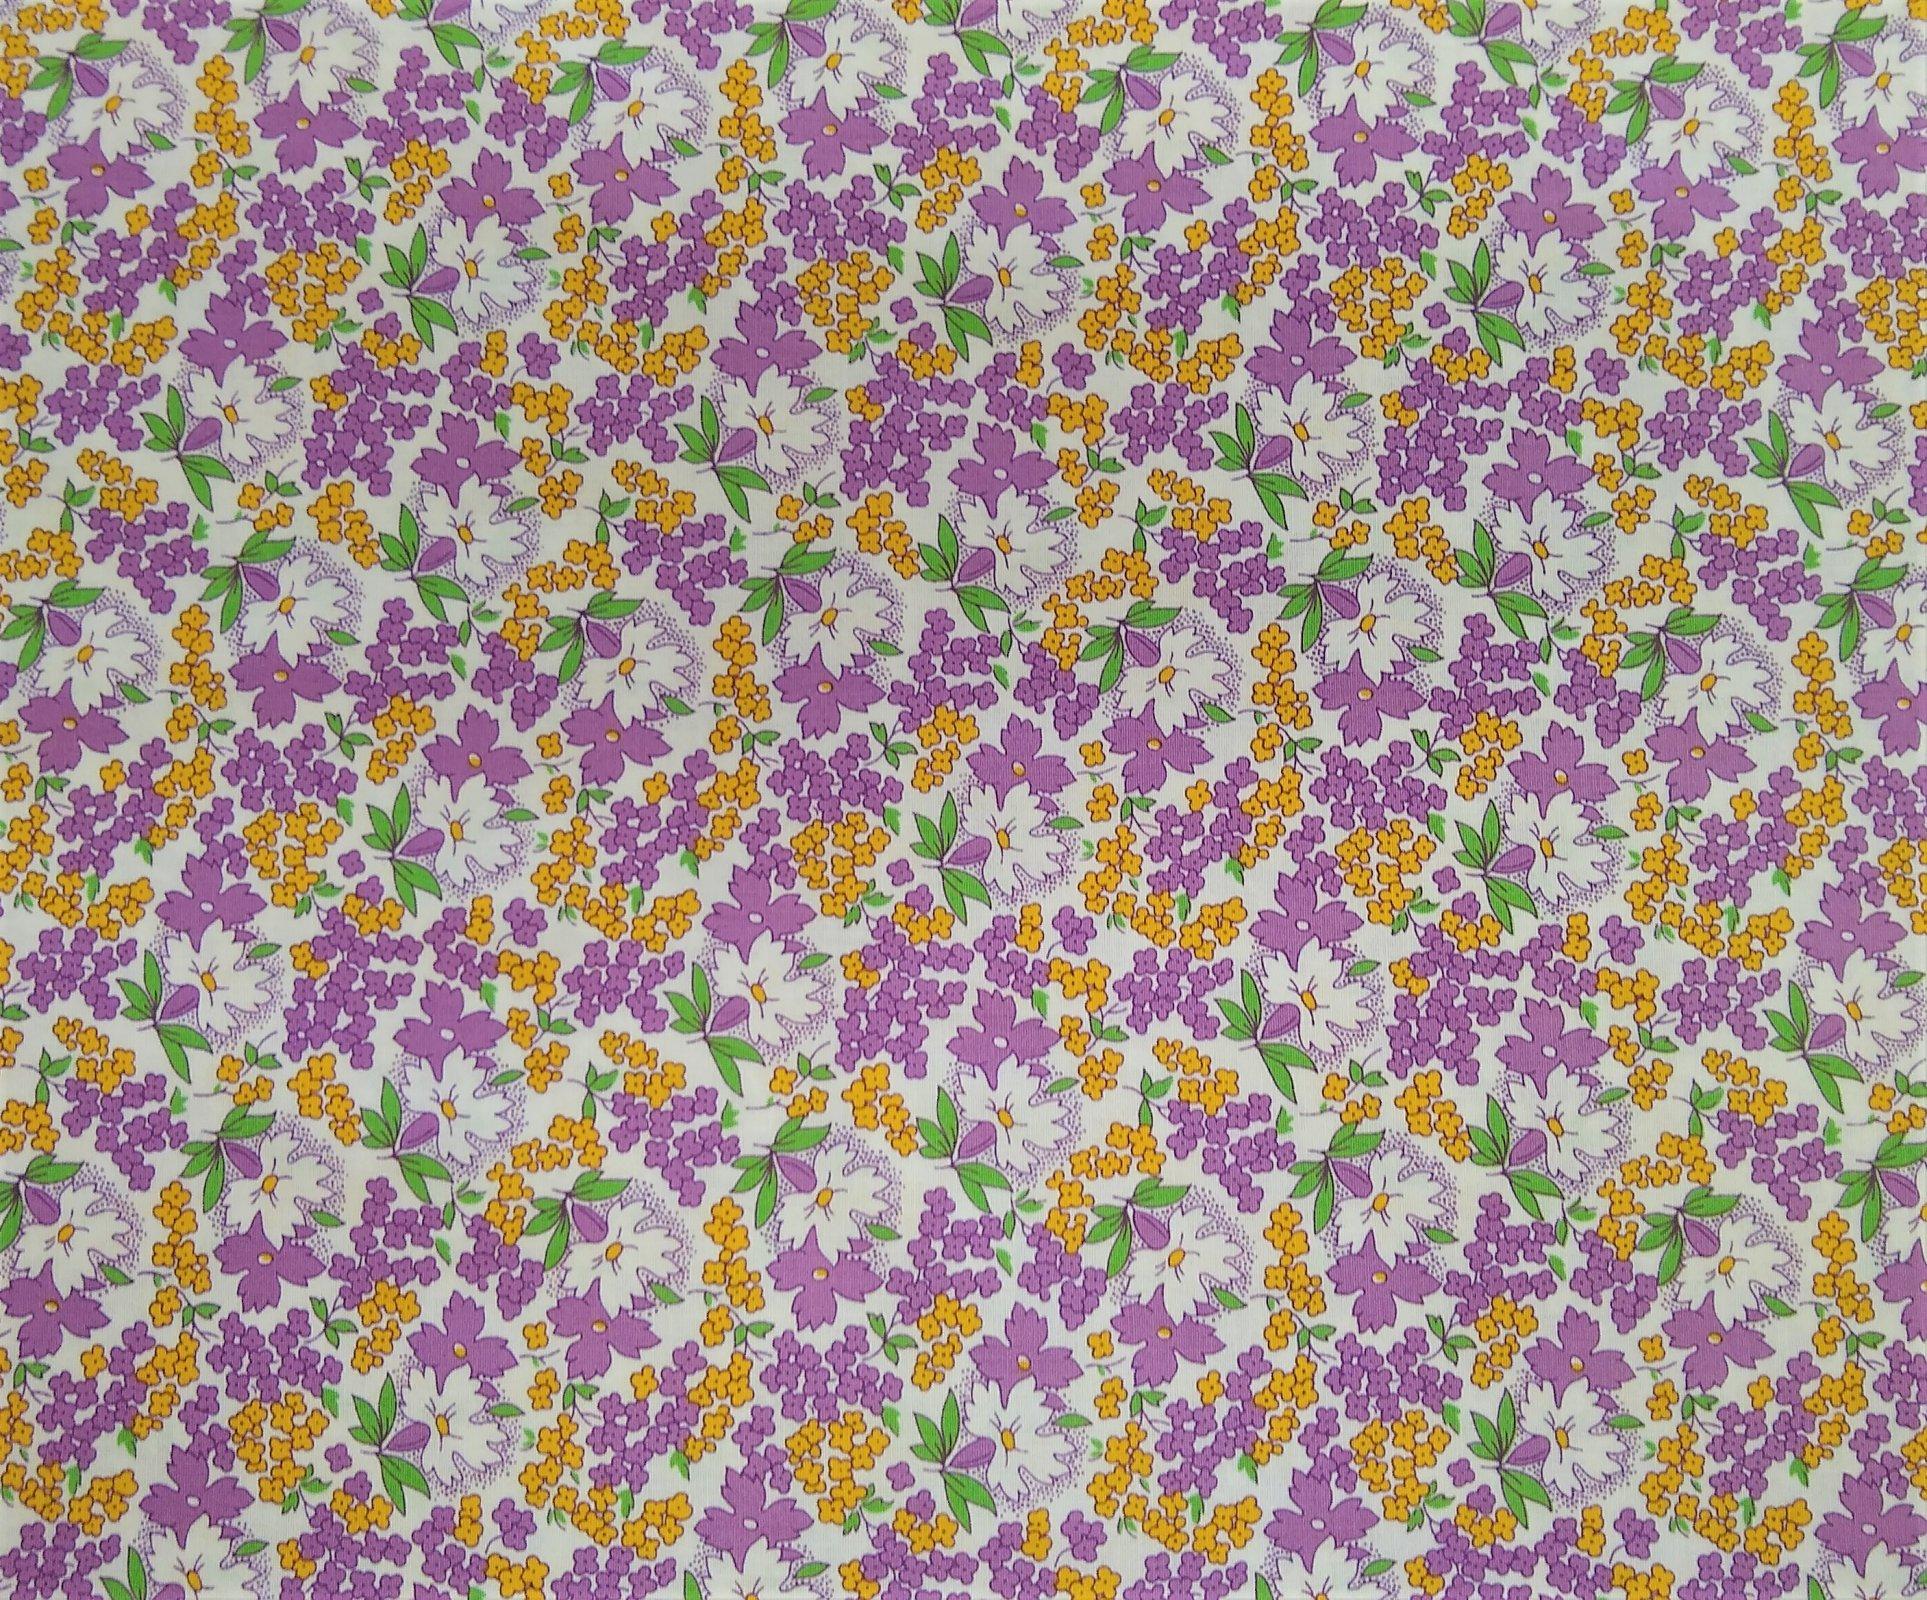 Toy Box IV by: Sara Morgan - 8255-004 - Blue Hill Fabrics